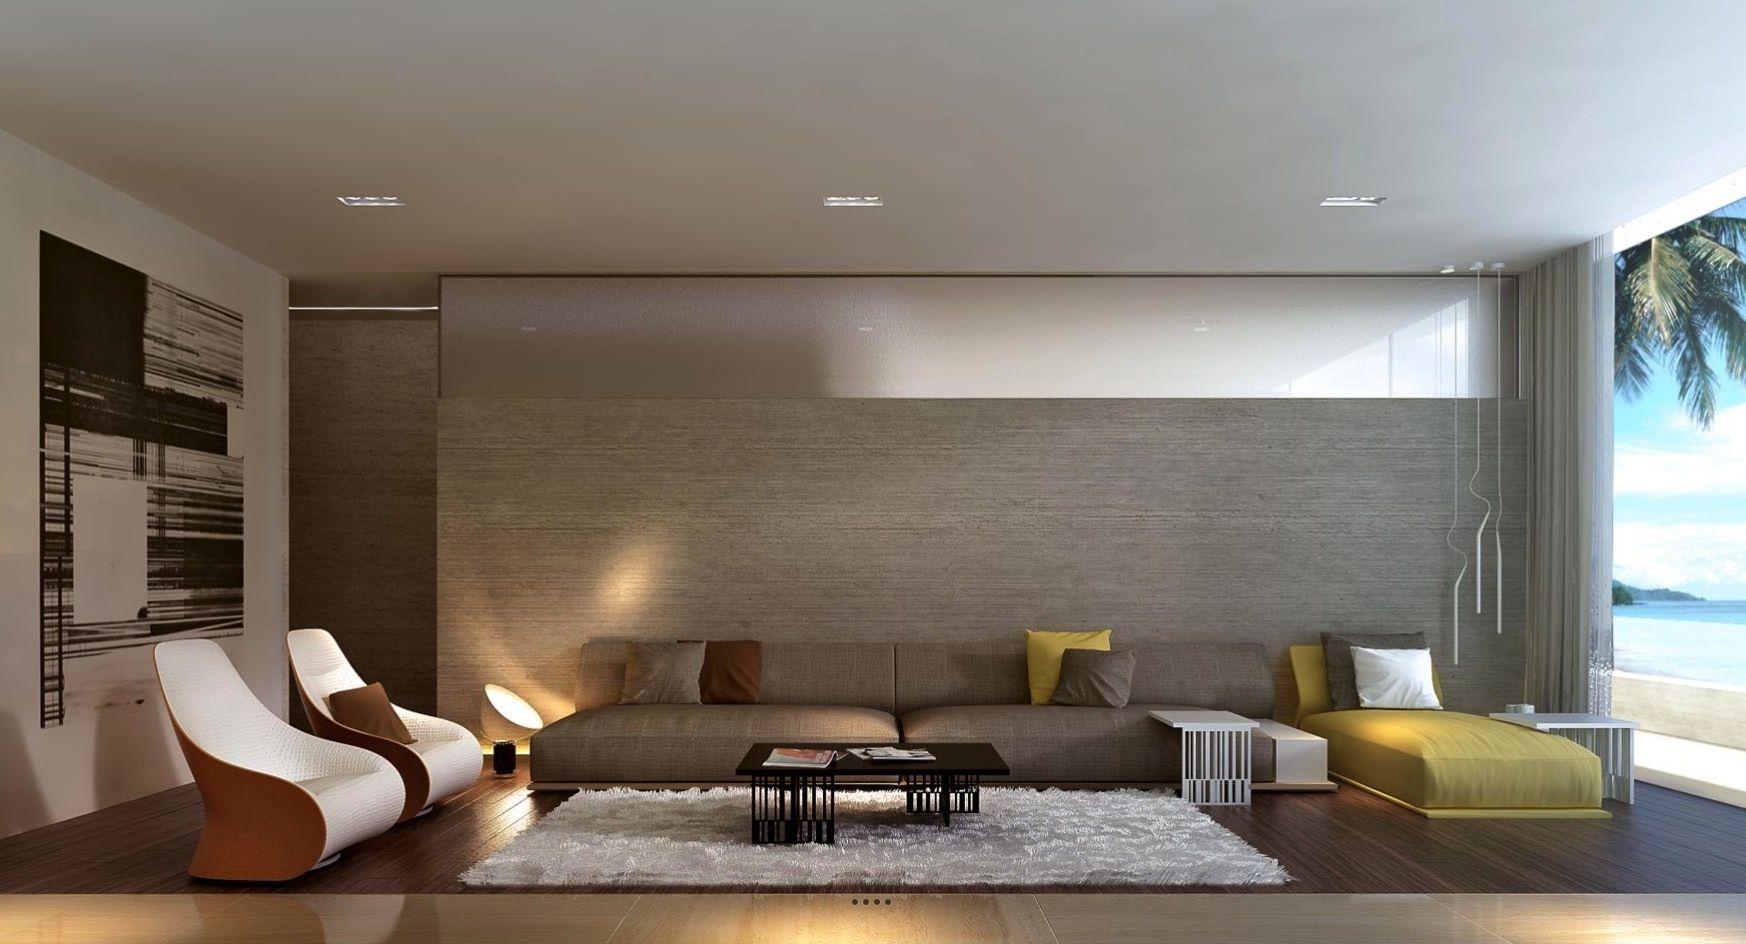 Living Room Sleek Simple Luxury Low Ground Bit Mustard Yellow